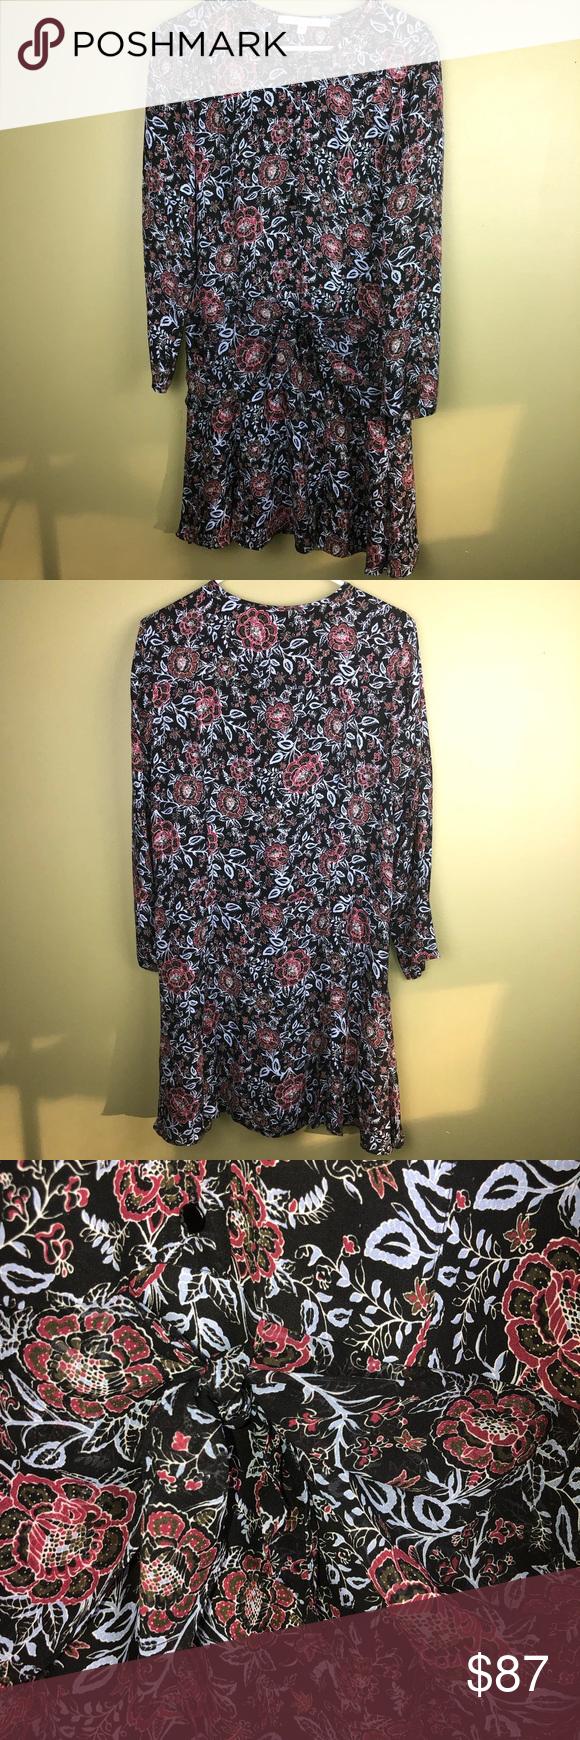 Veronica Beard Drop Tie Waist Silk Dress Size 12 In 2020 Silk Dress Diy Wedding Dress Patterns Silk Midi Dress [ 1740 x 580 Pixel ]